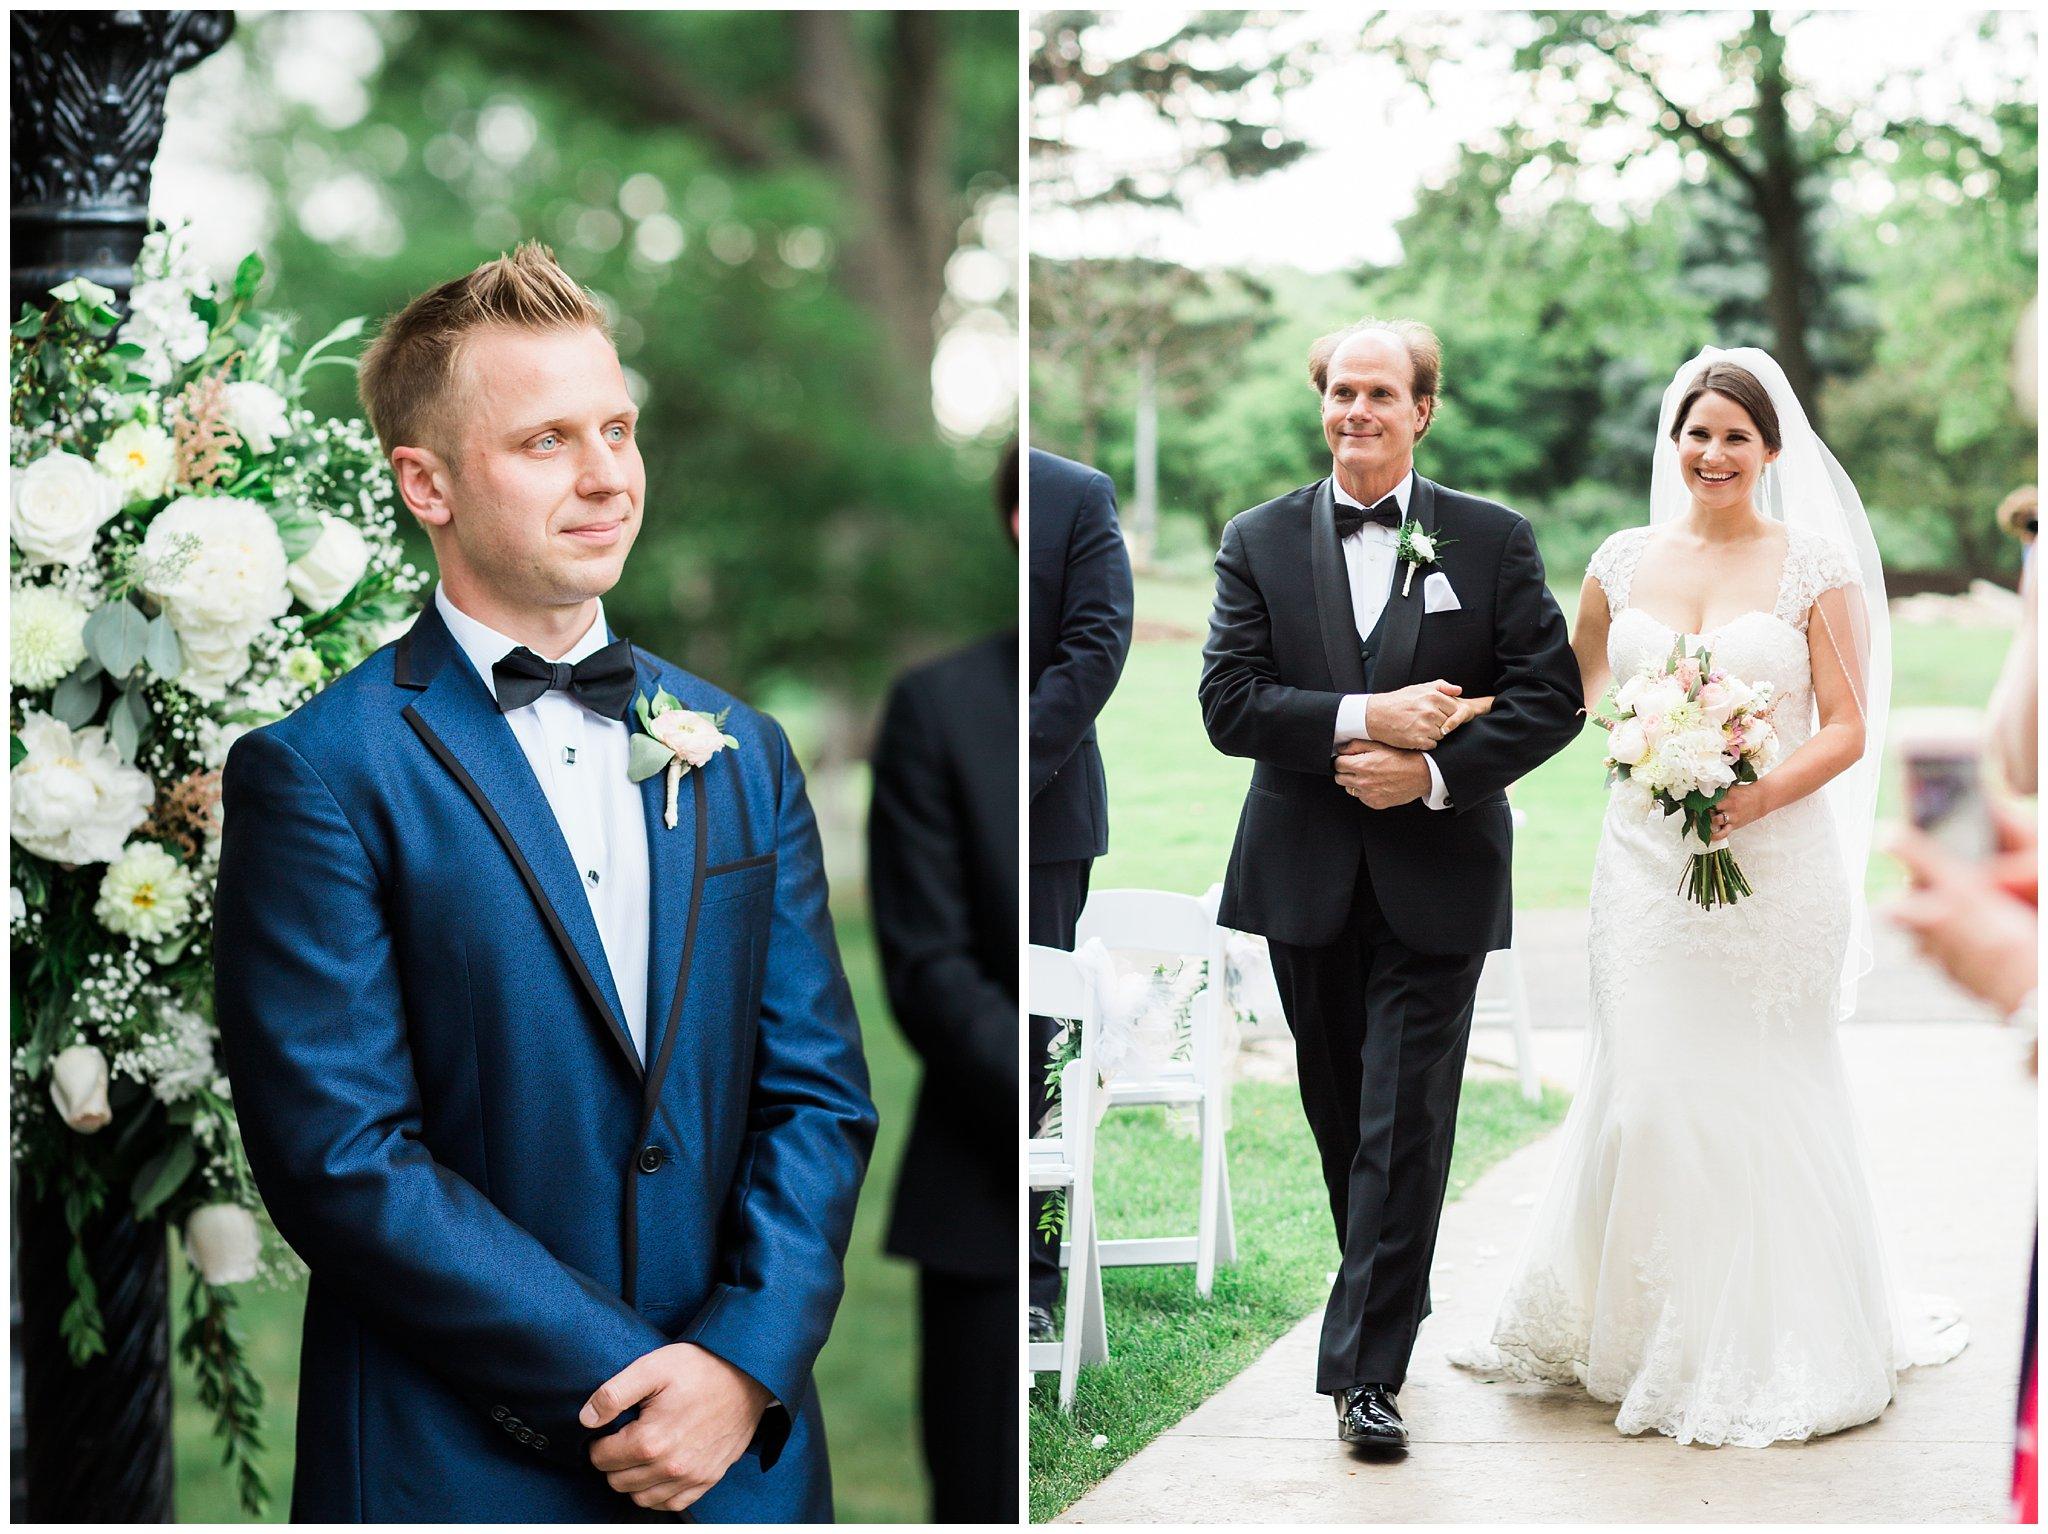 Alicia&Kurt_RavisloeCountryClubWedding_Chicagoweddingphotographer_RebeccaHaleyPhotography_0175.jpg